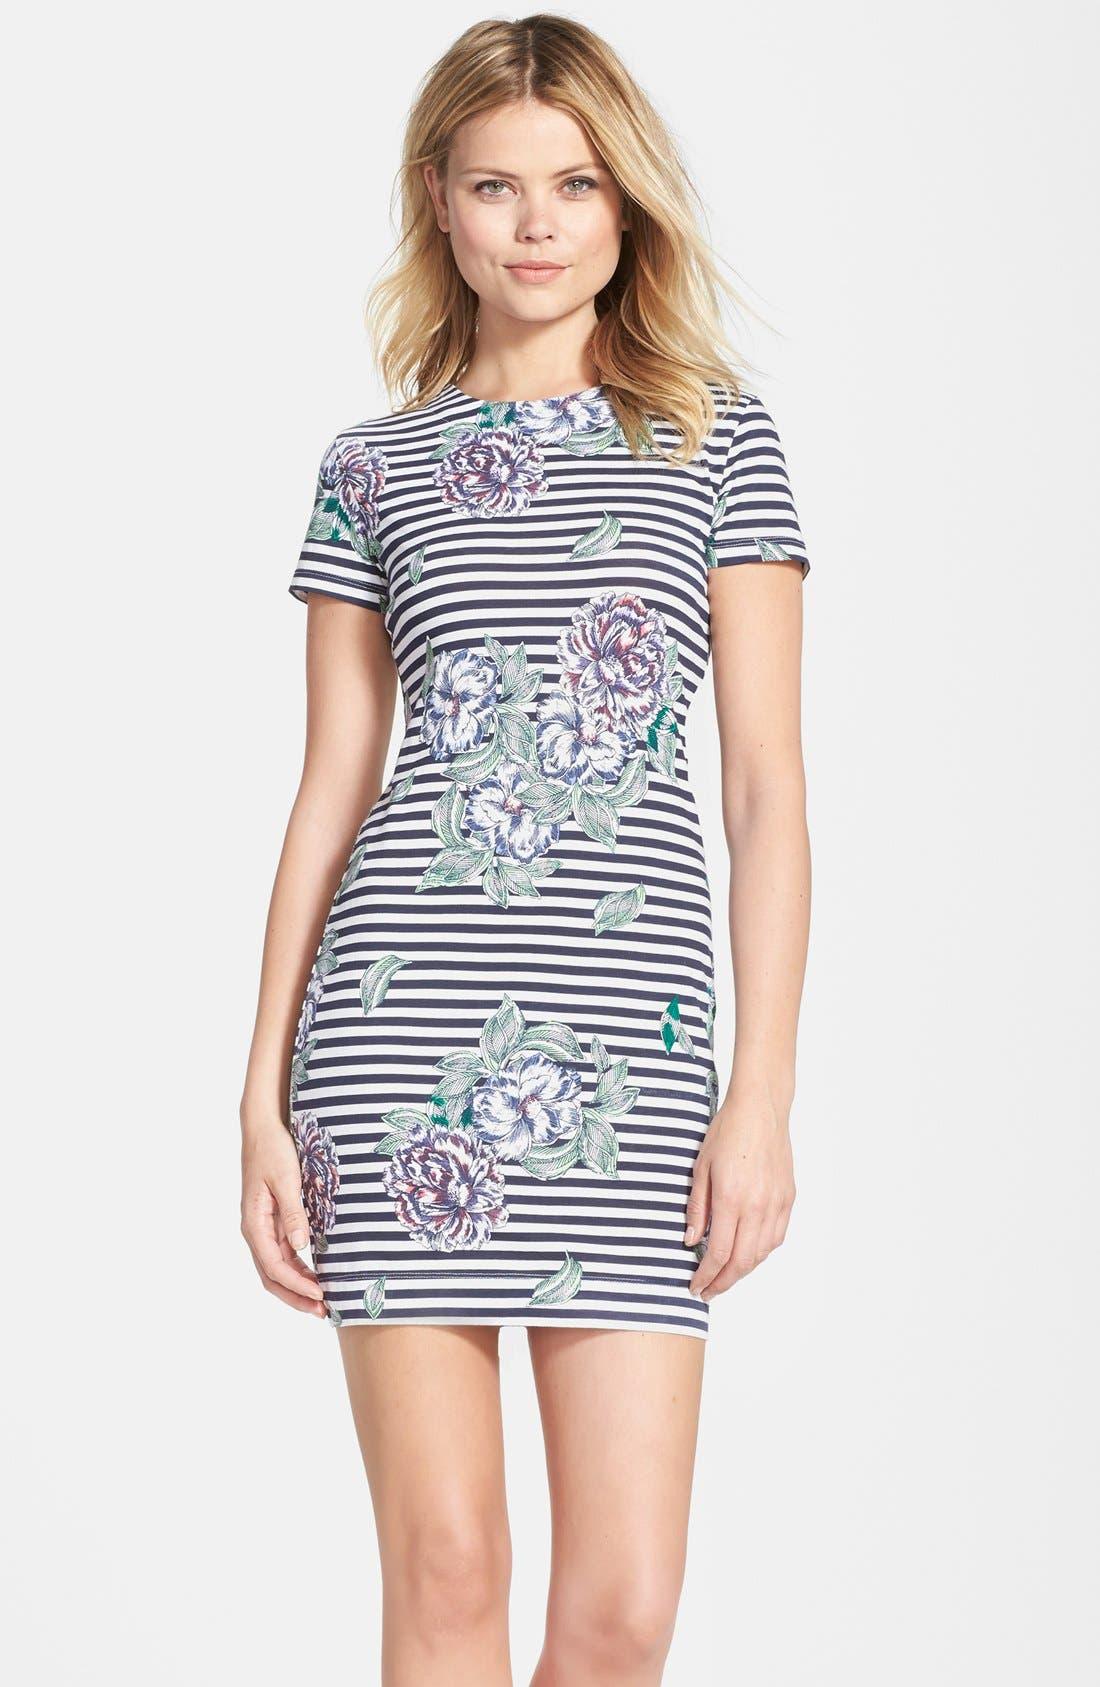 Main Image - French Connection 'Bonita' Stripe Floral Body-Con Dress